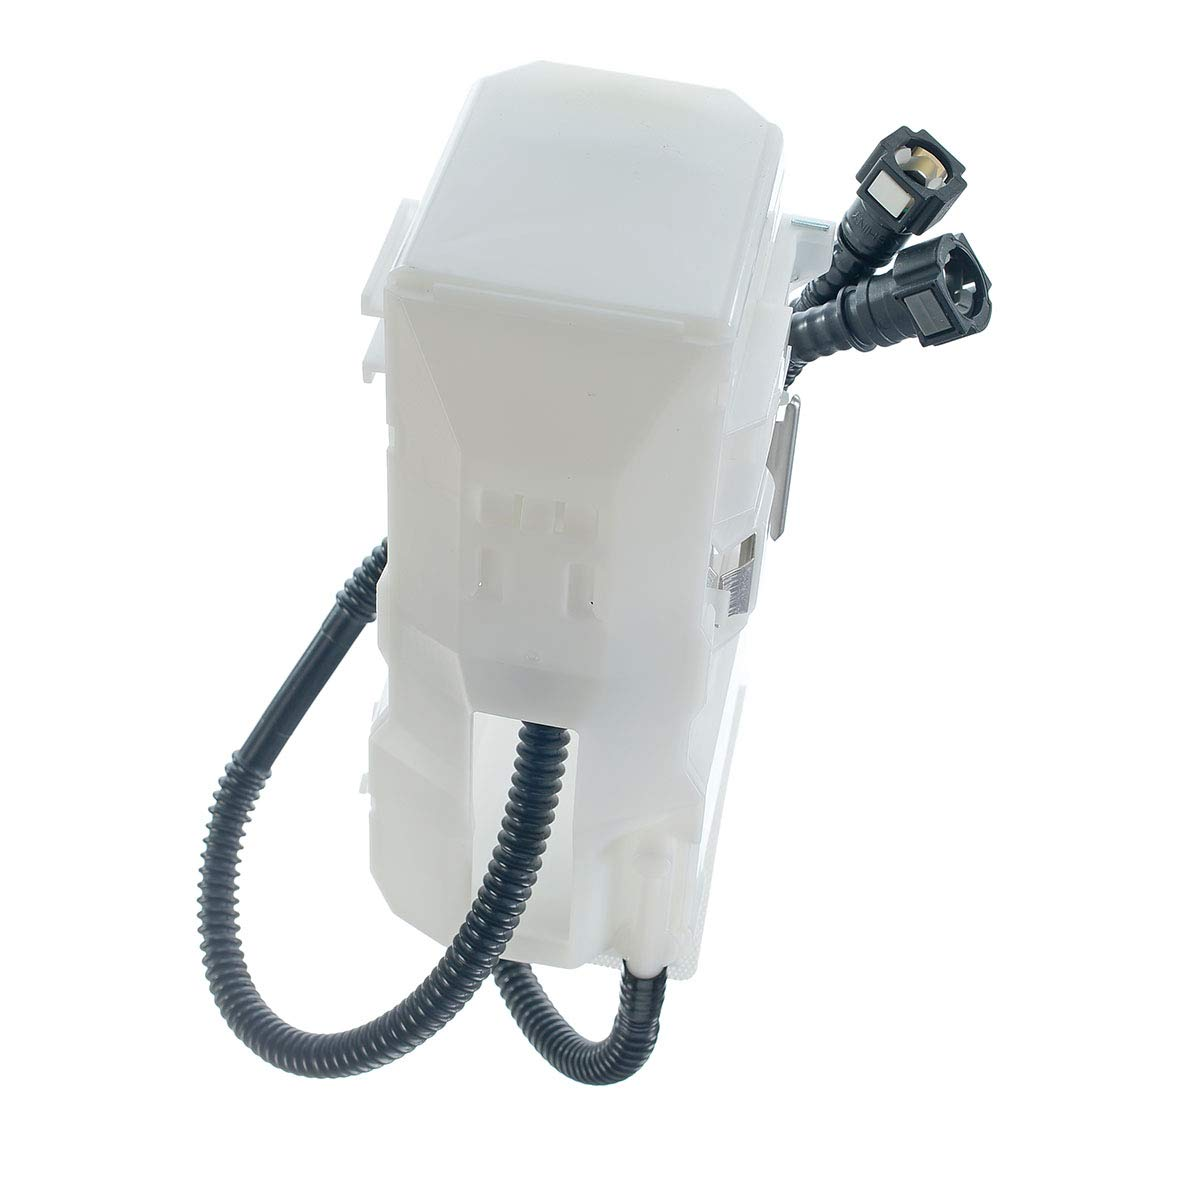 Electric Fuel Pump Assembly for Jeep Liberty 2004 2.4L 3.7L